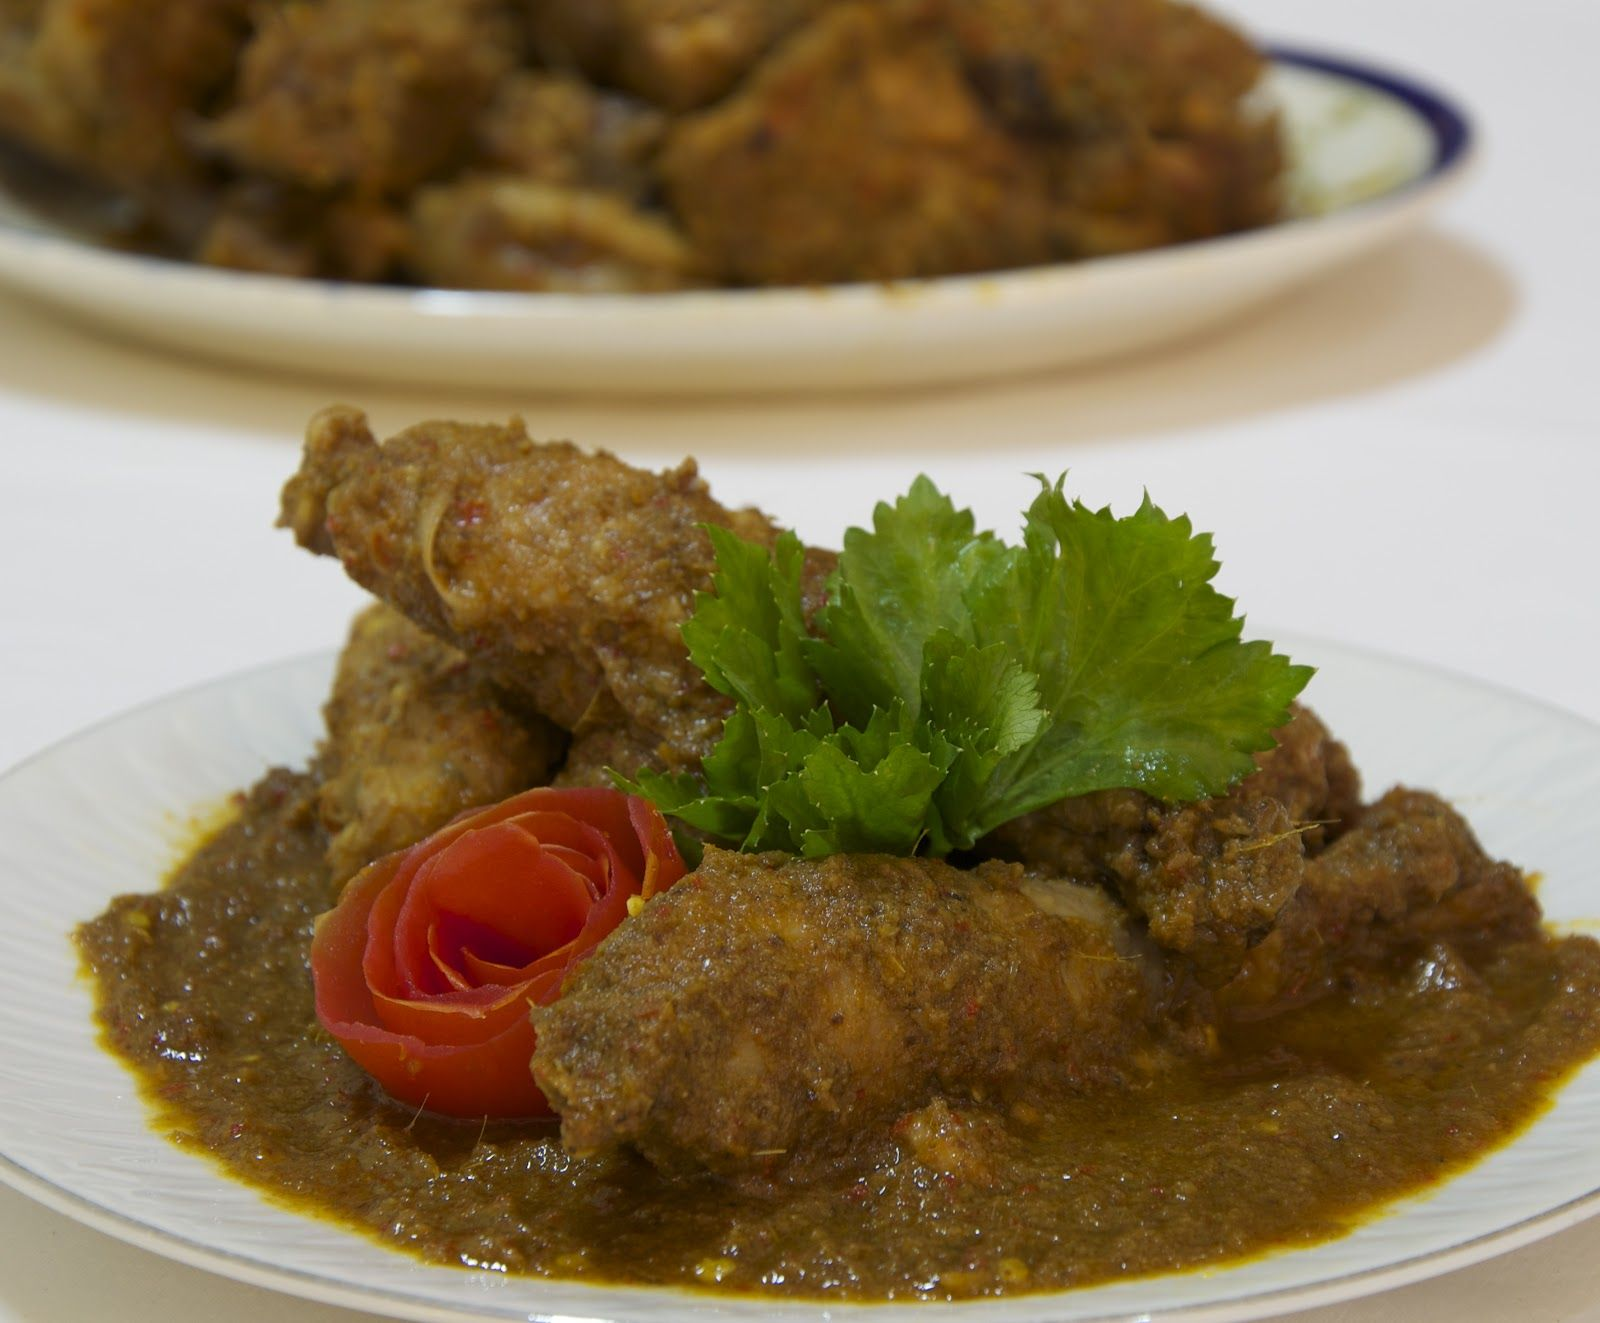 Indonesian medan food ayam pinadar batak style chicken indonesian medan food ayam pinadar batak style chicken forumfinder Choice Image